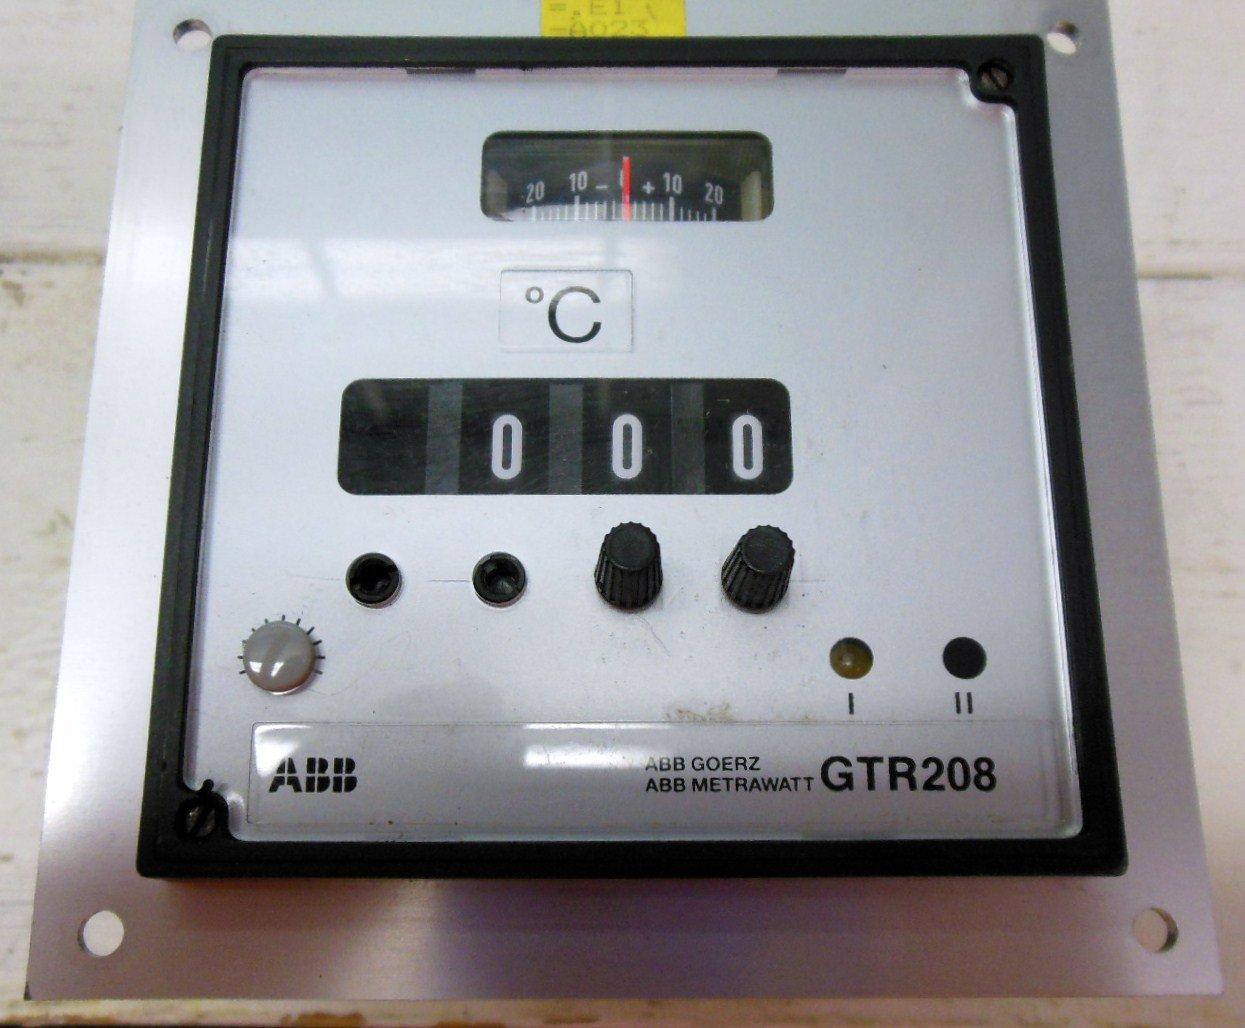 Abb metrawatt gtr208 temperature controller 0 200 degree for Abb motor starter selection tool